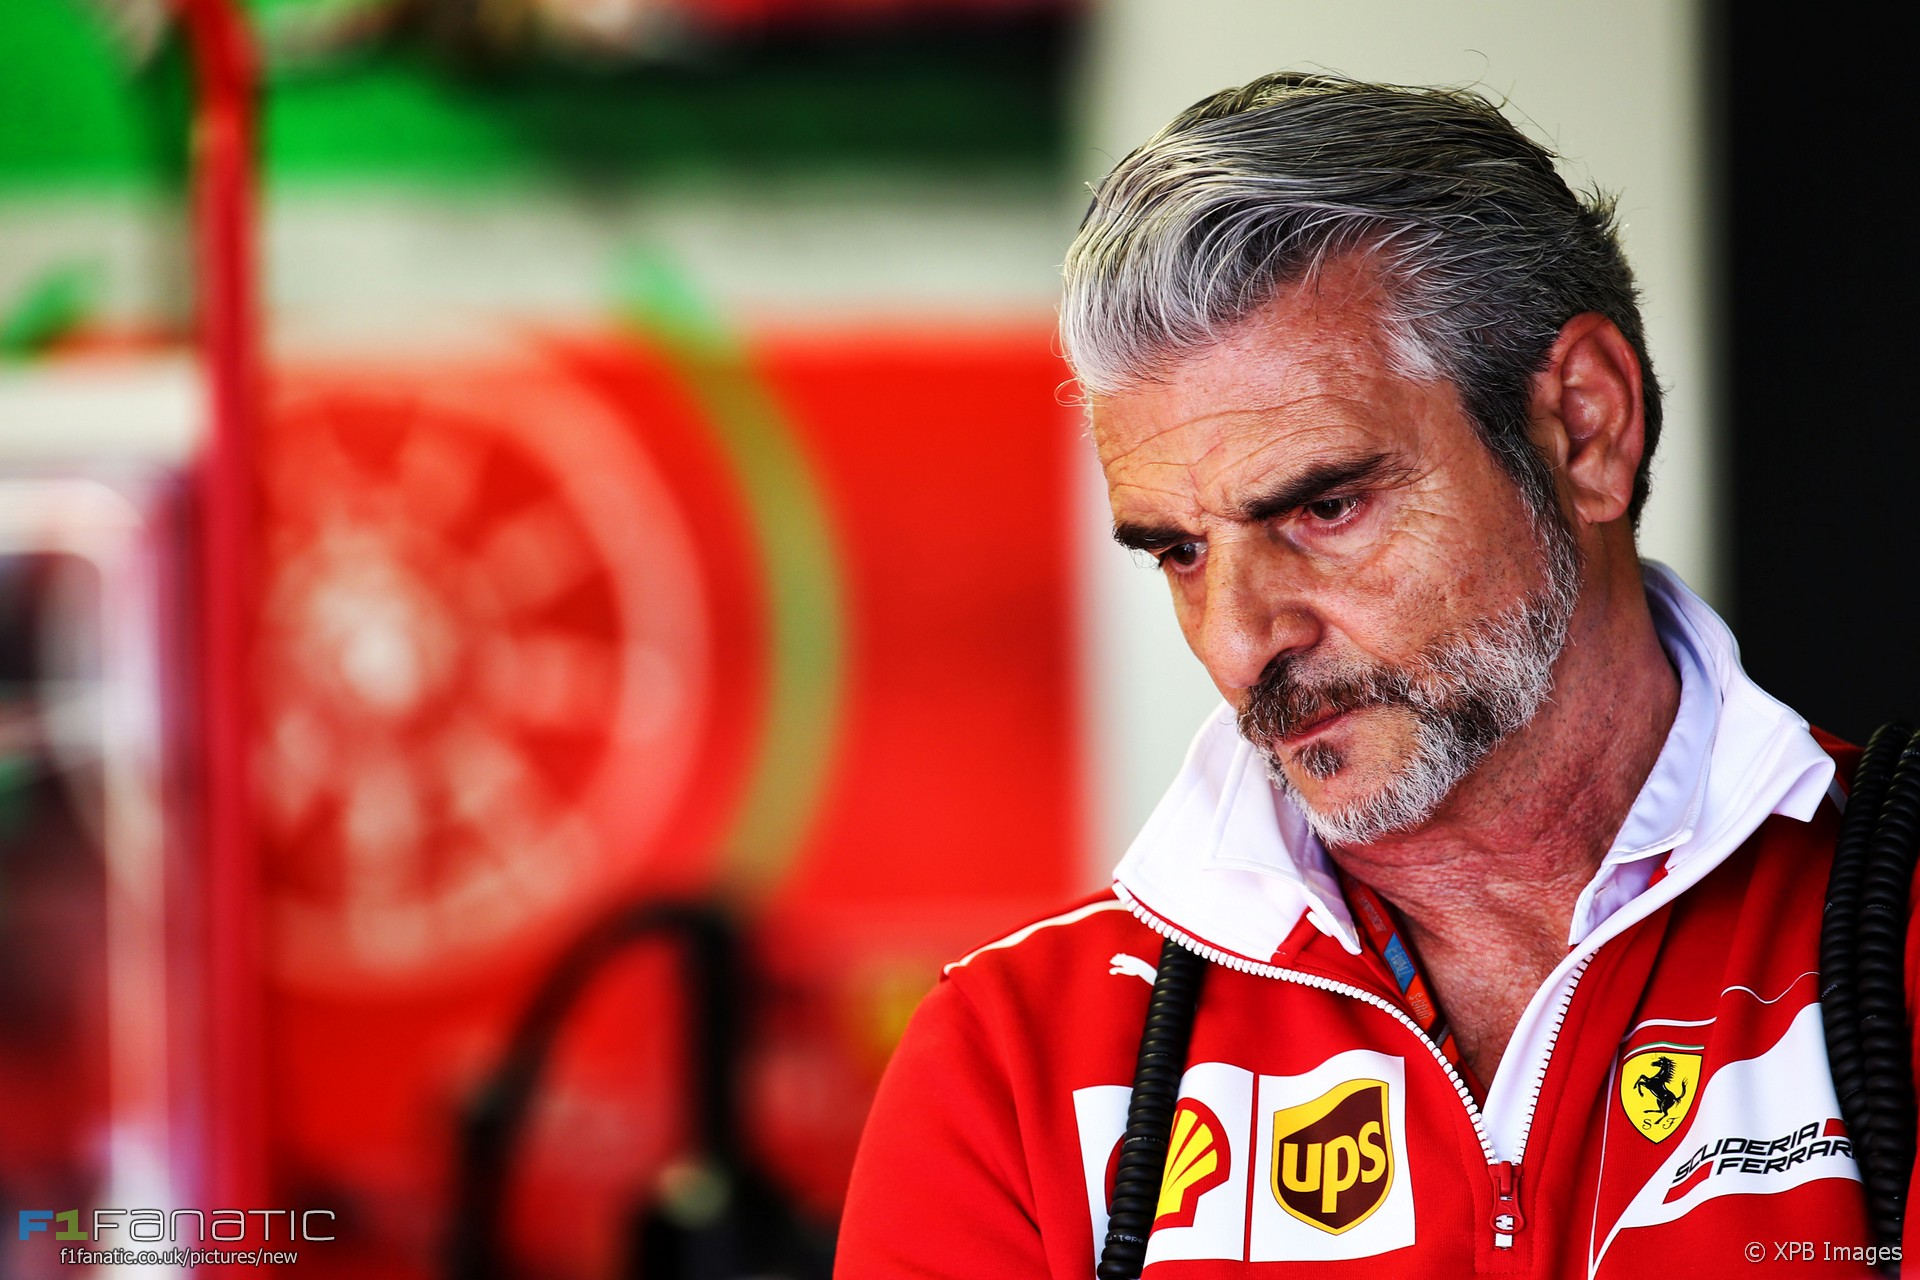 Maurizio Arrivabene, Ferrari, Circuit Gilles Villeneuve, 2017